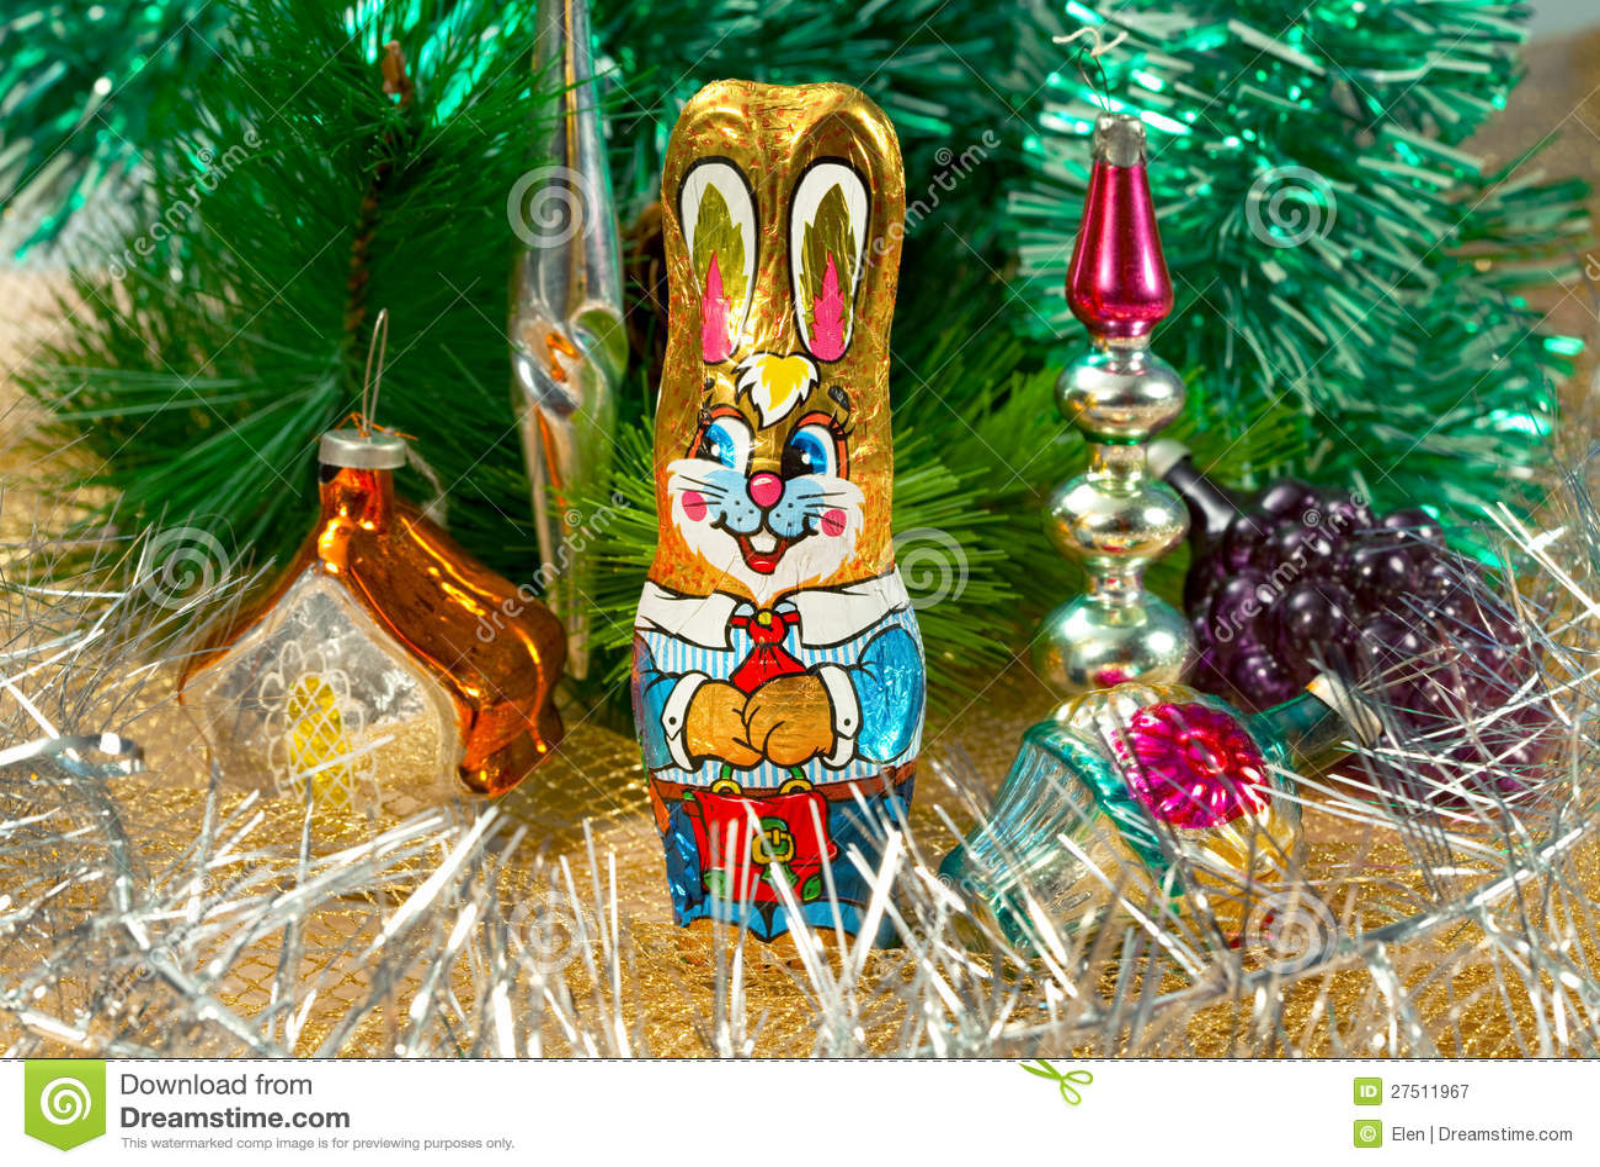 Chocolate rabbit and christmas decorations stock image for Chocolate christmas decorations